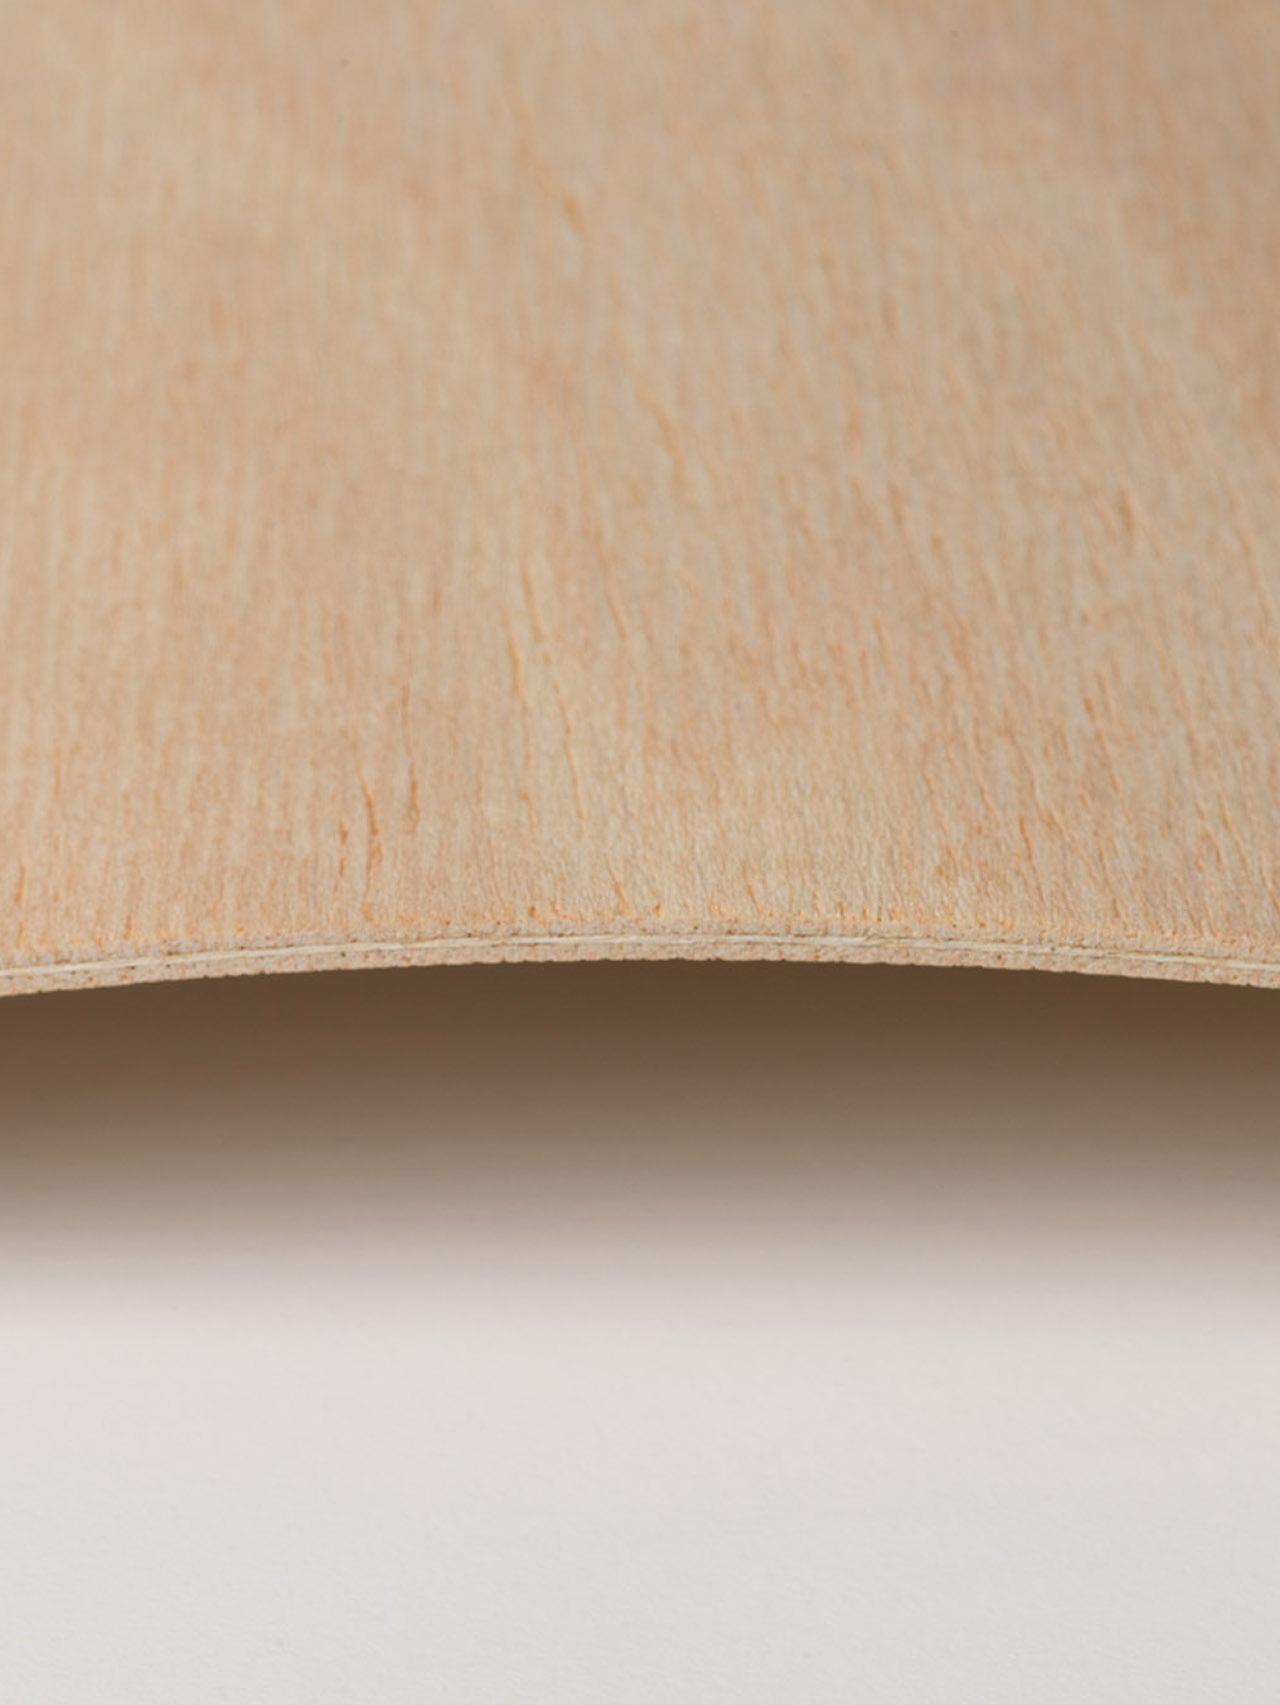 Ceyba Flexible Plywood Panneaux